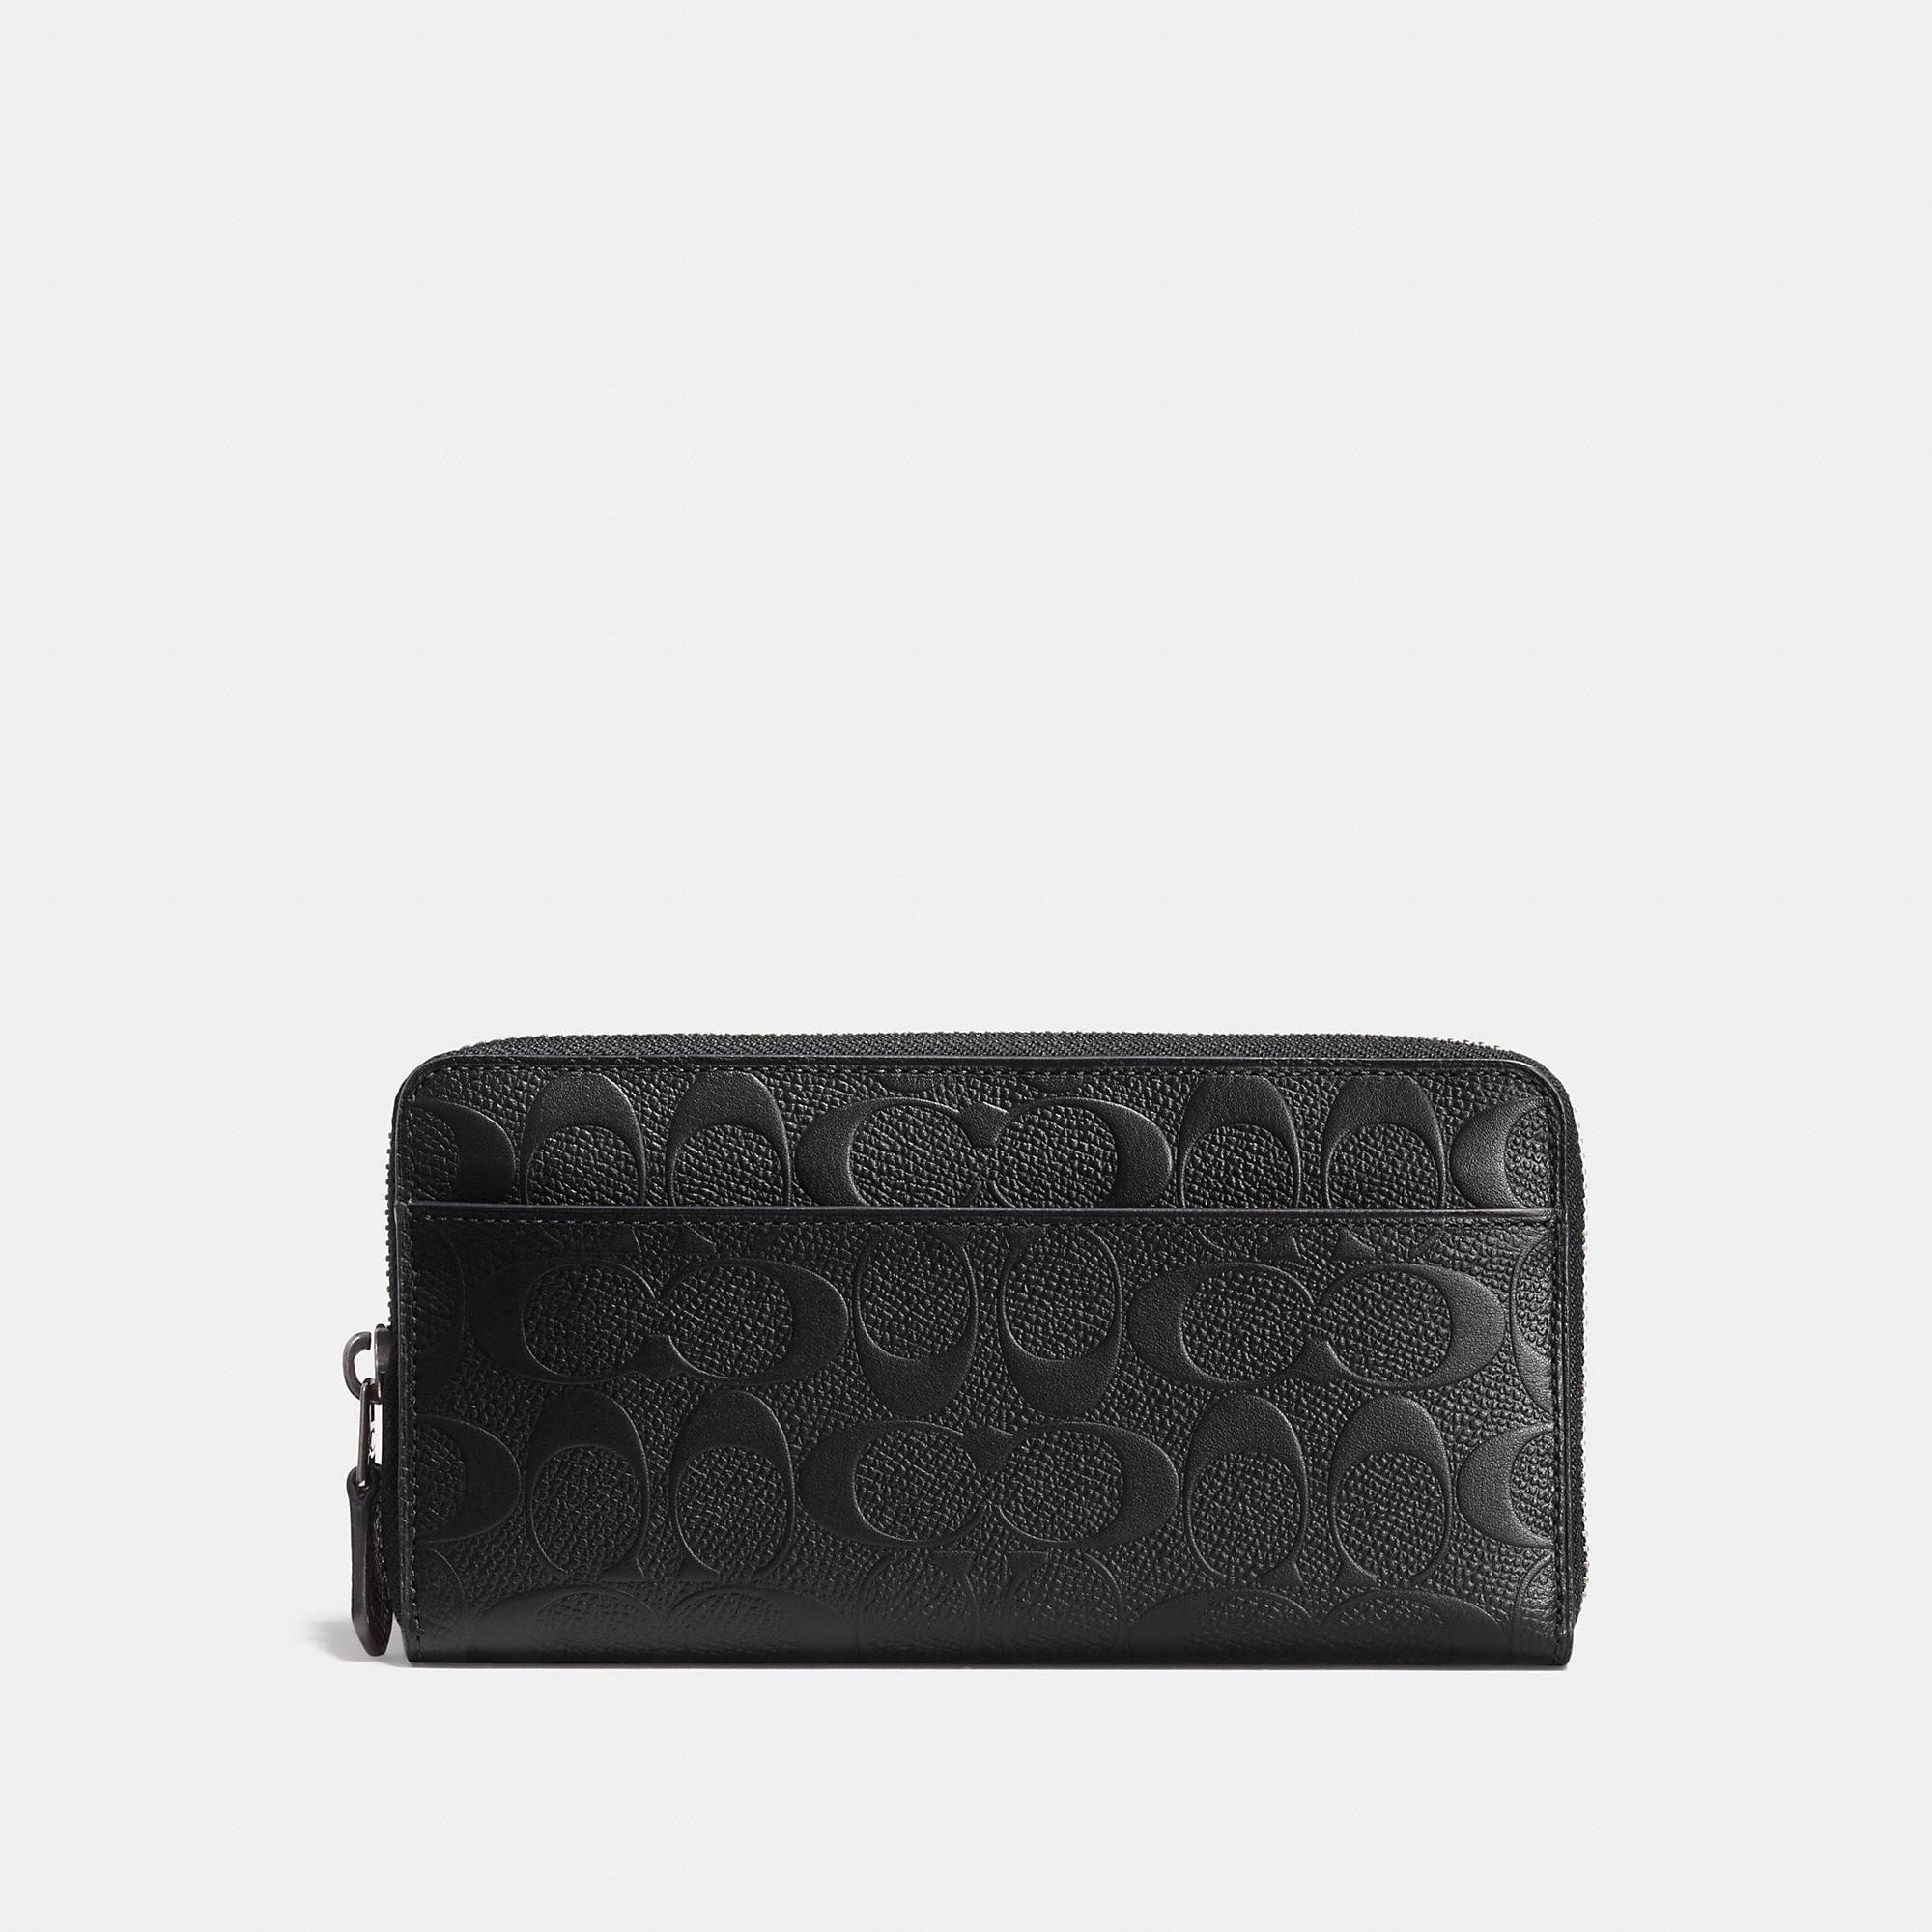 Coach Accordion Wallet In Signature Crossgrain Leather